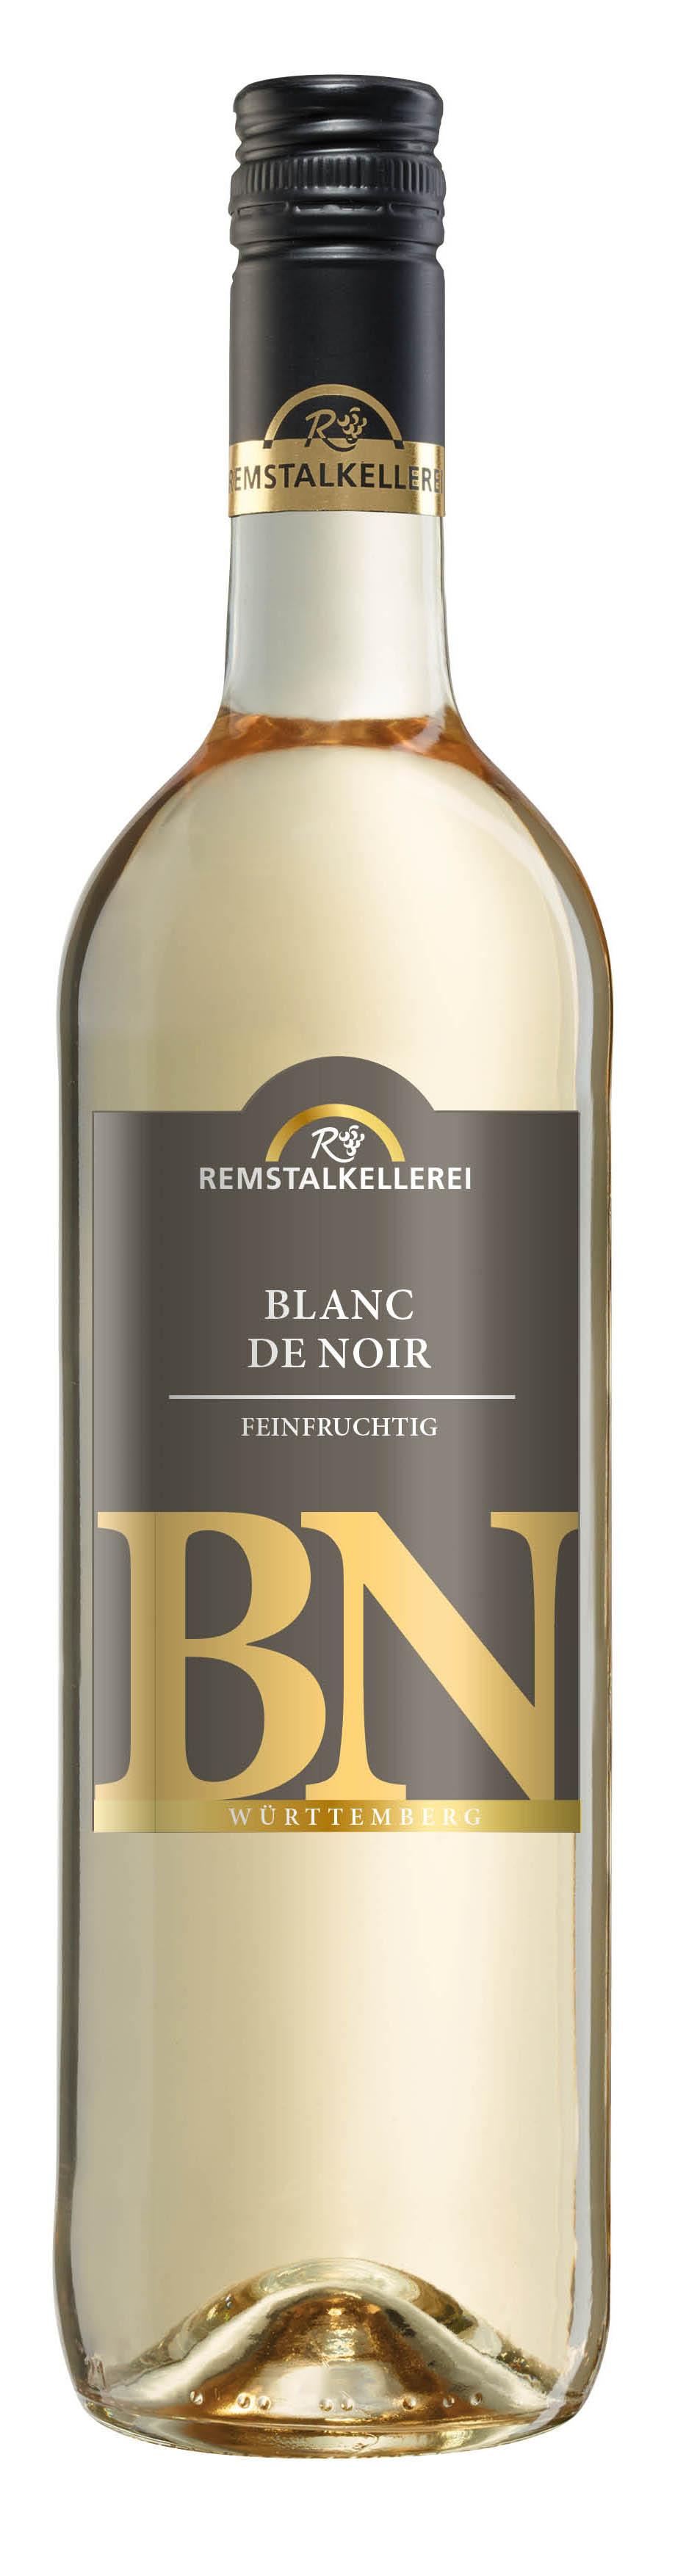 "Blanc de Noir ""BN"""